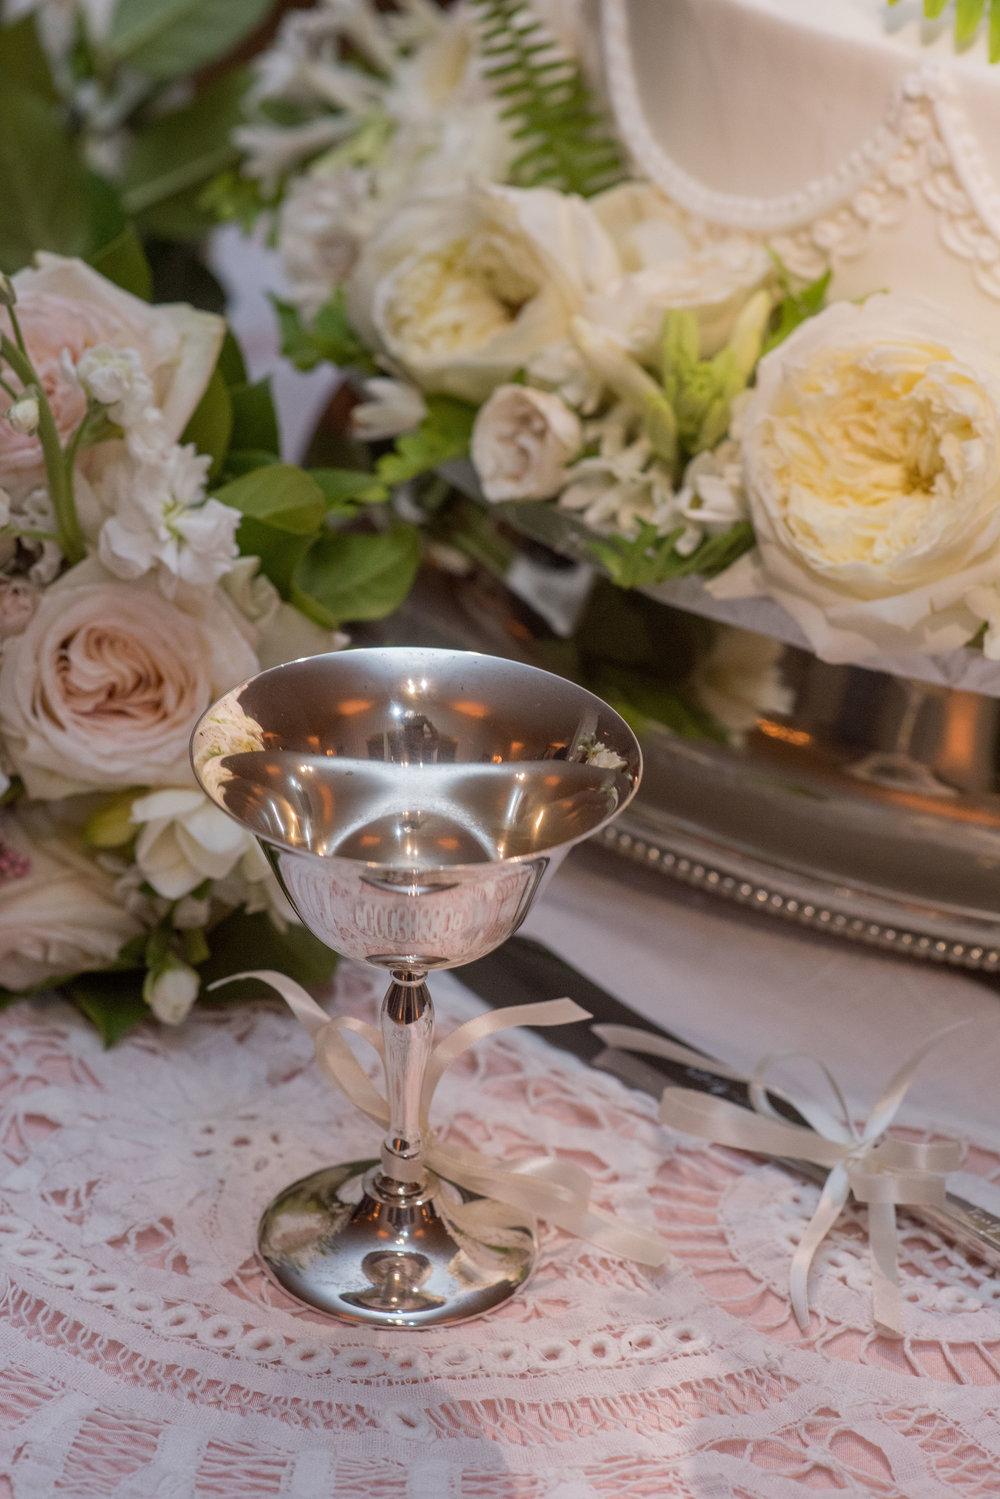 North Carolina Wedding, Events by Reagan, Destination Wedding Planner, Cake, lace table cloth